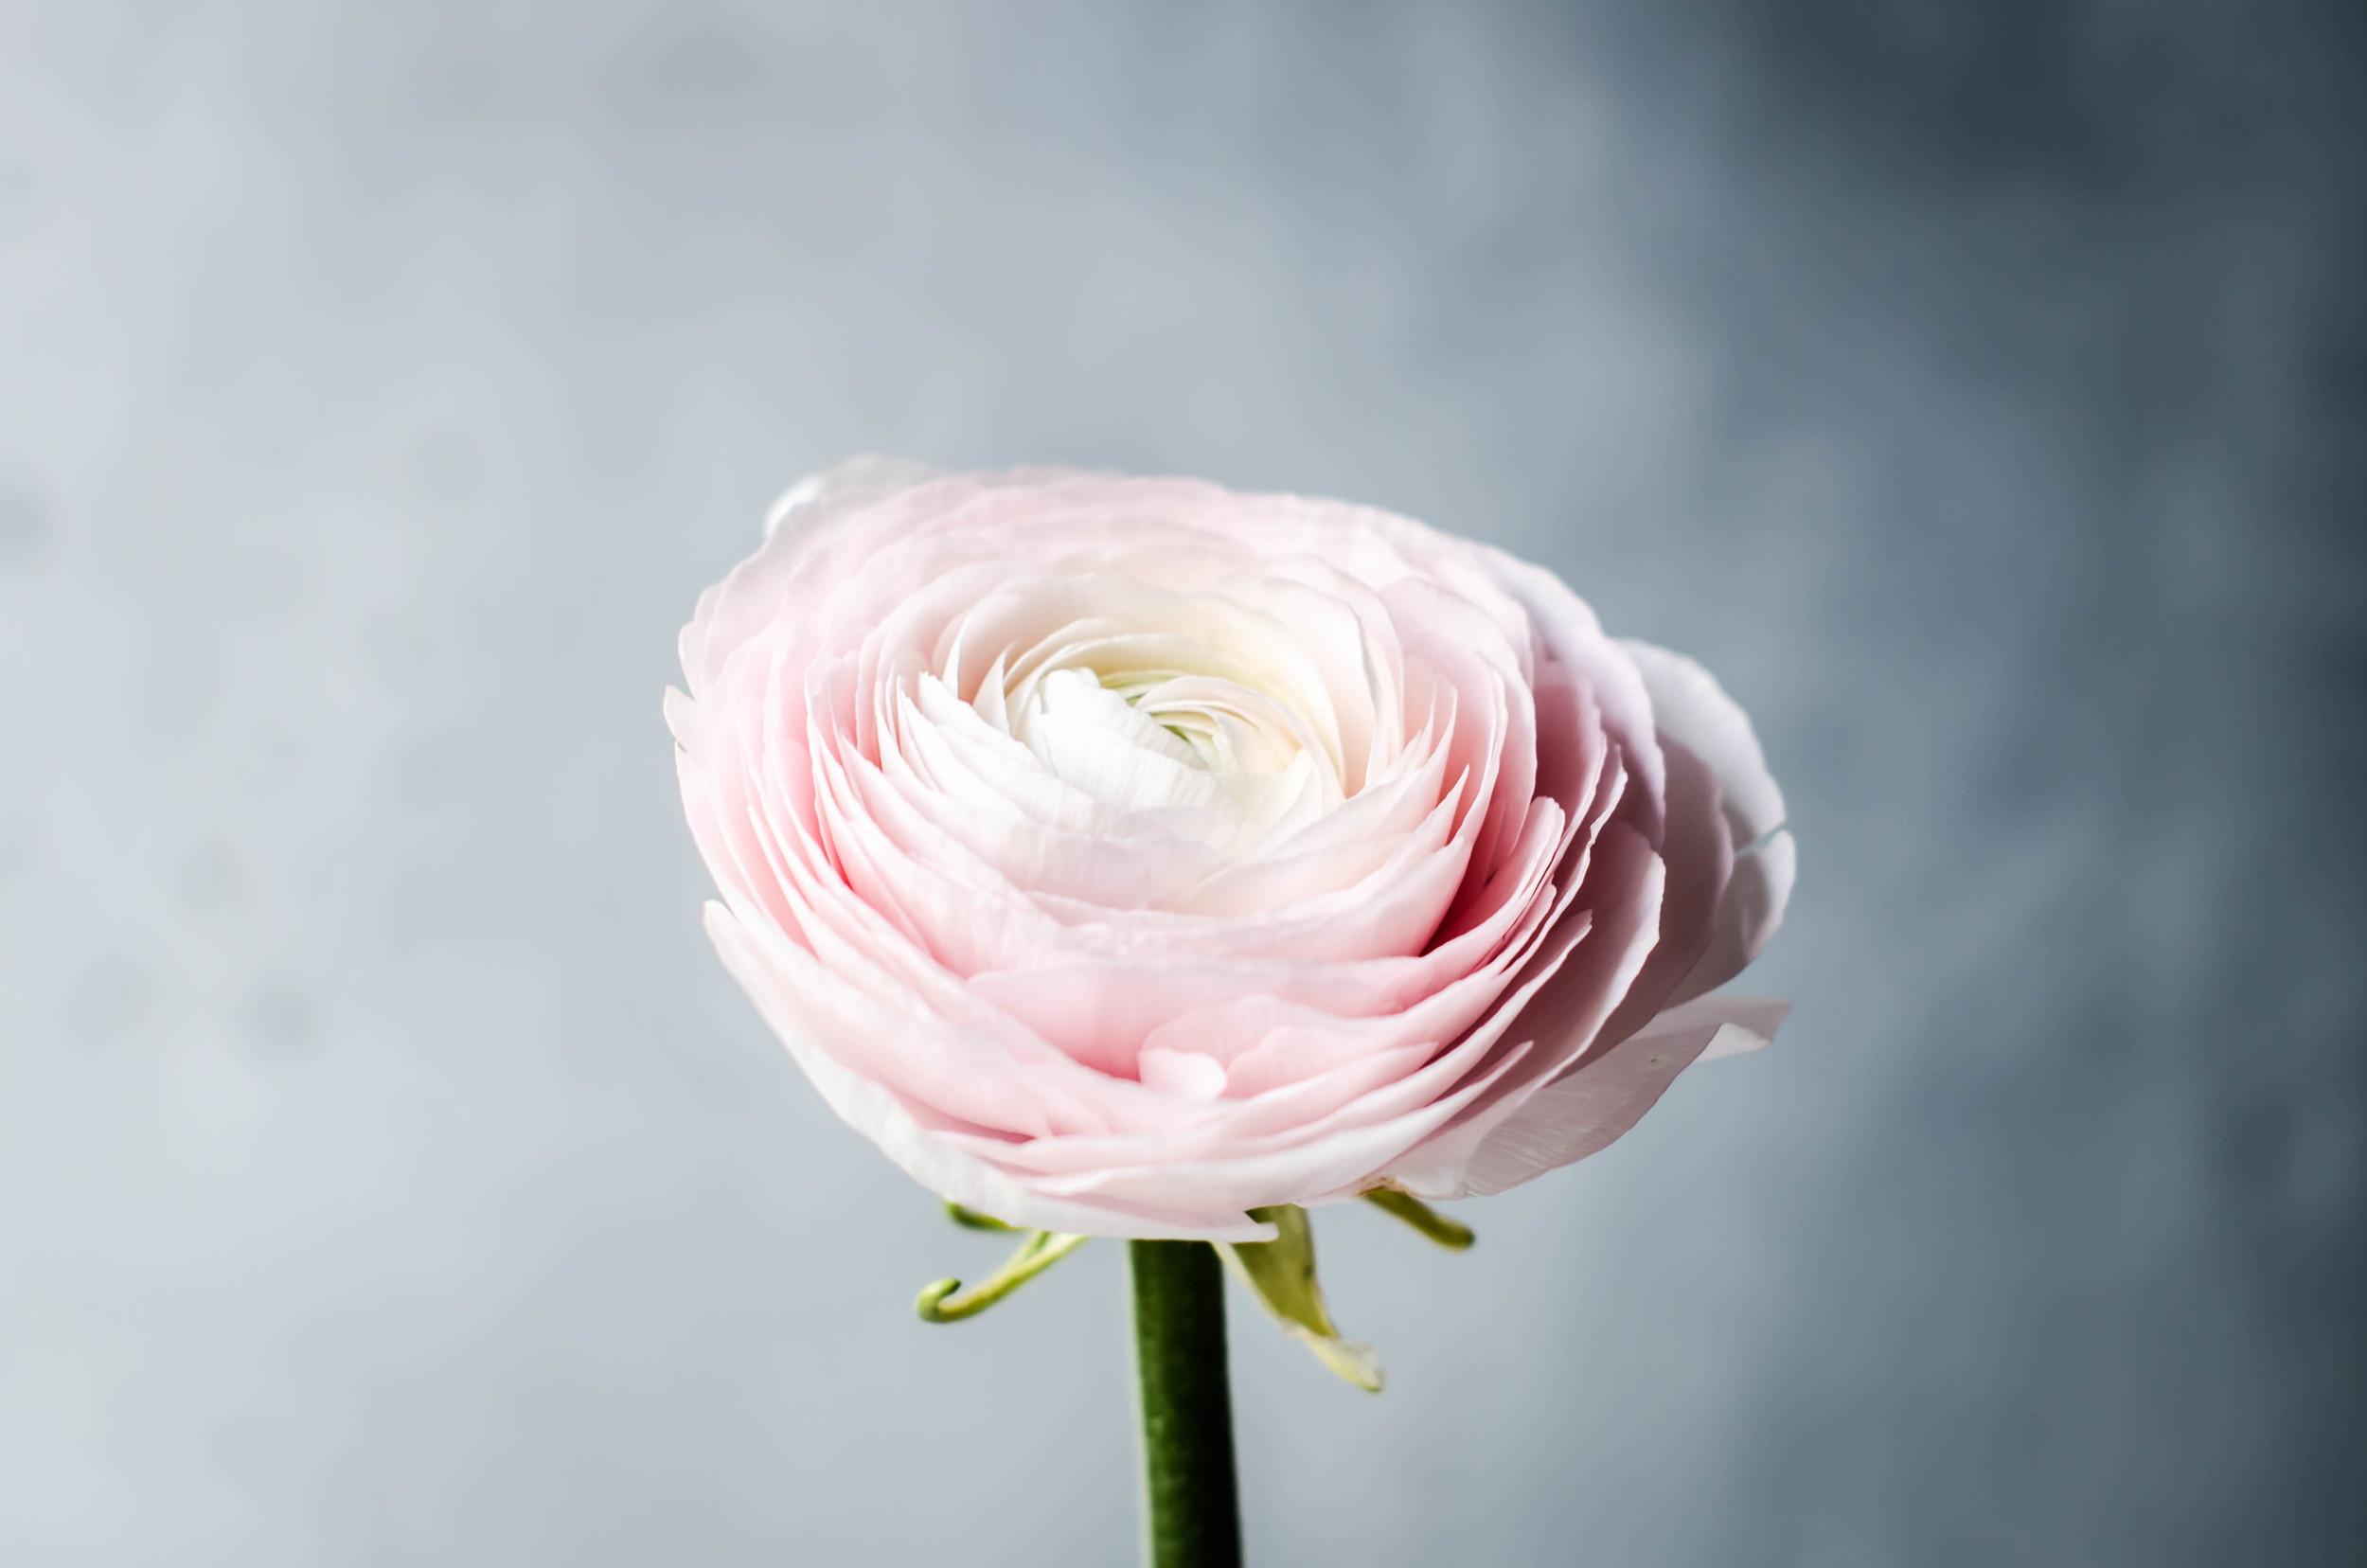 ROSE & IVY Journal Petal by Petal Cluny Ranunculus